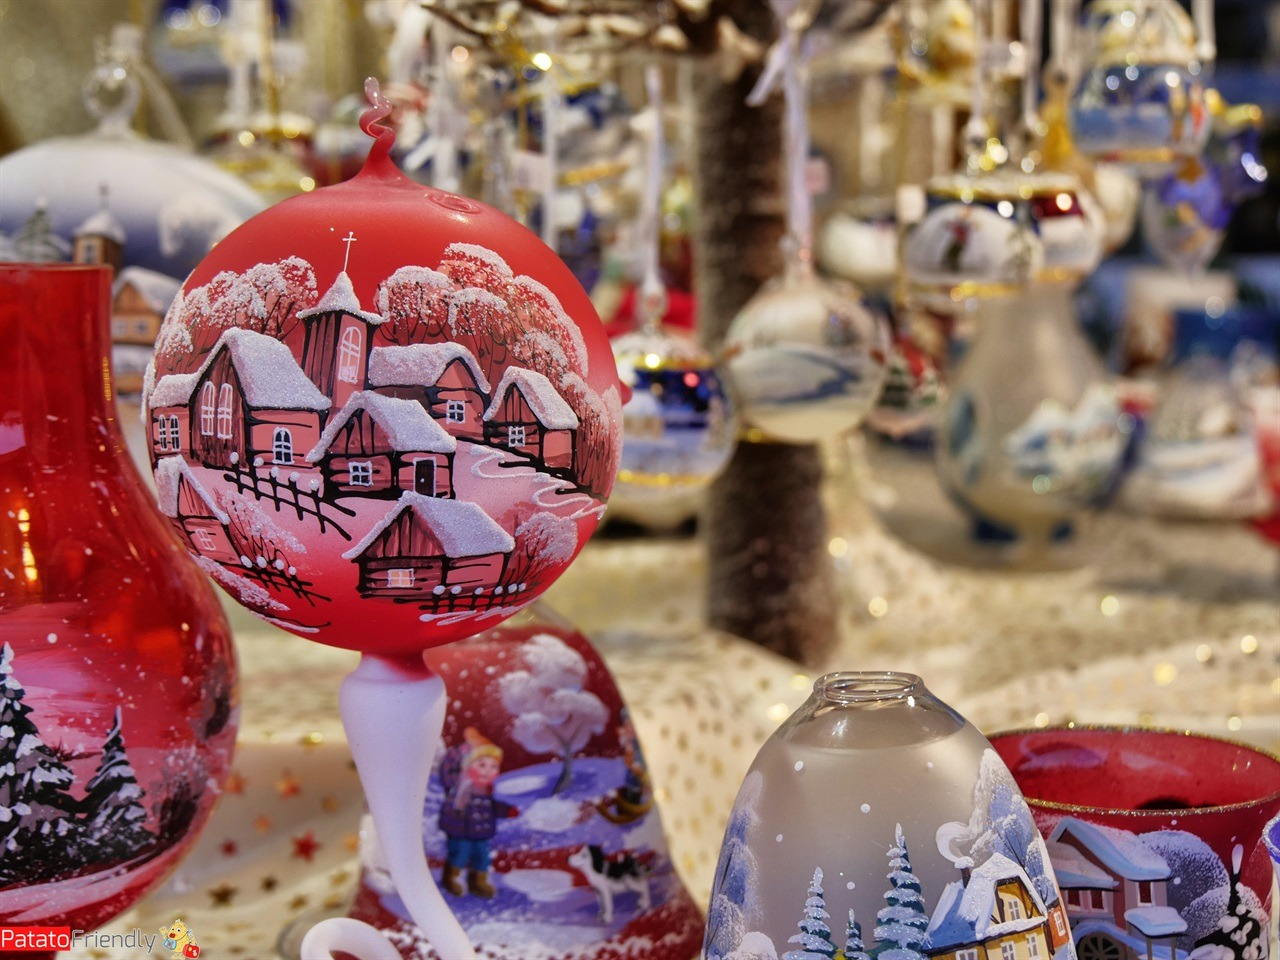 [cml_media_alt id='13145']Mercatini di Natale a Trento[/cml_media_alt]